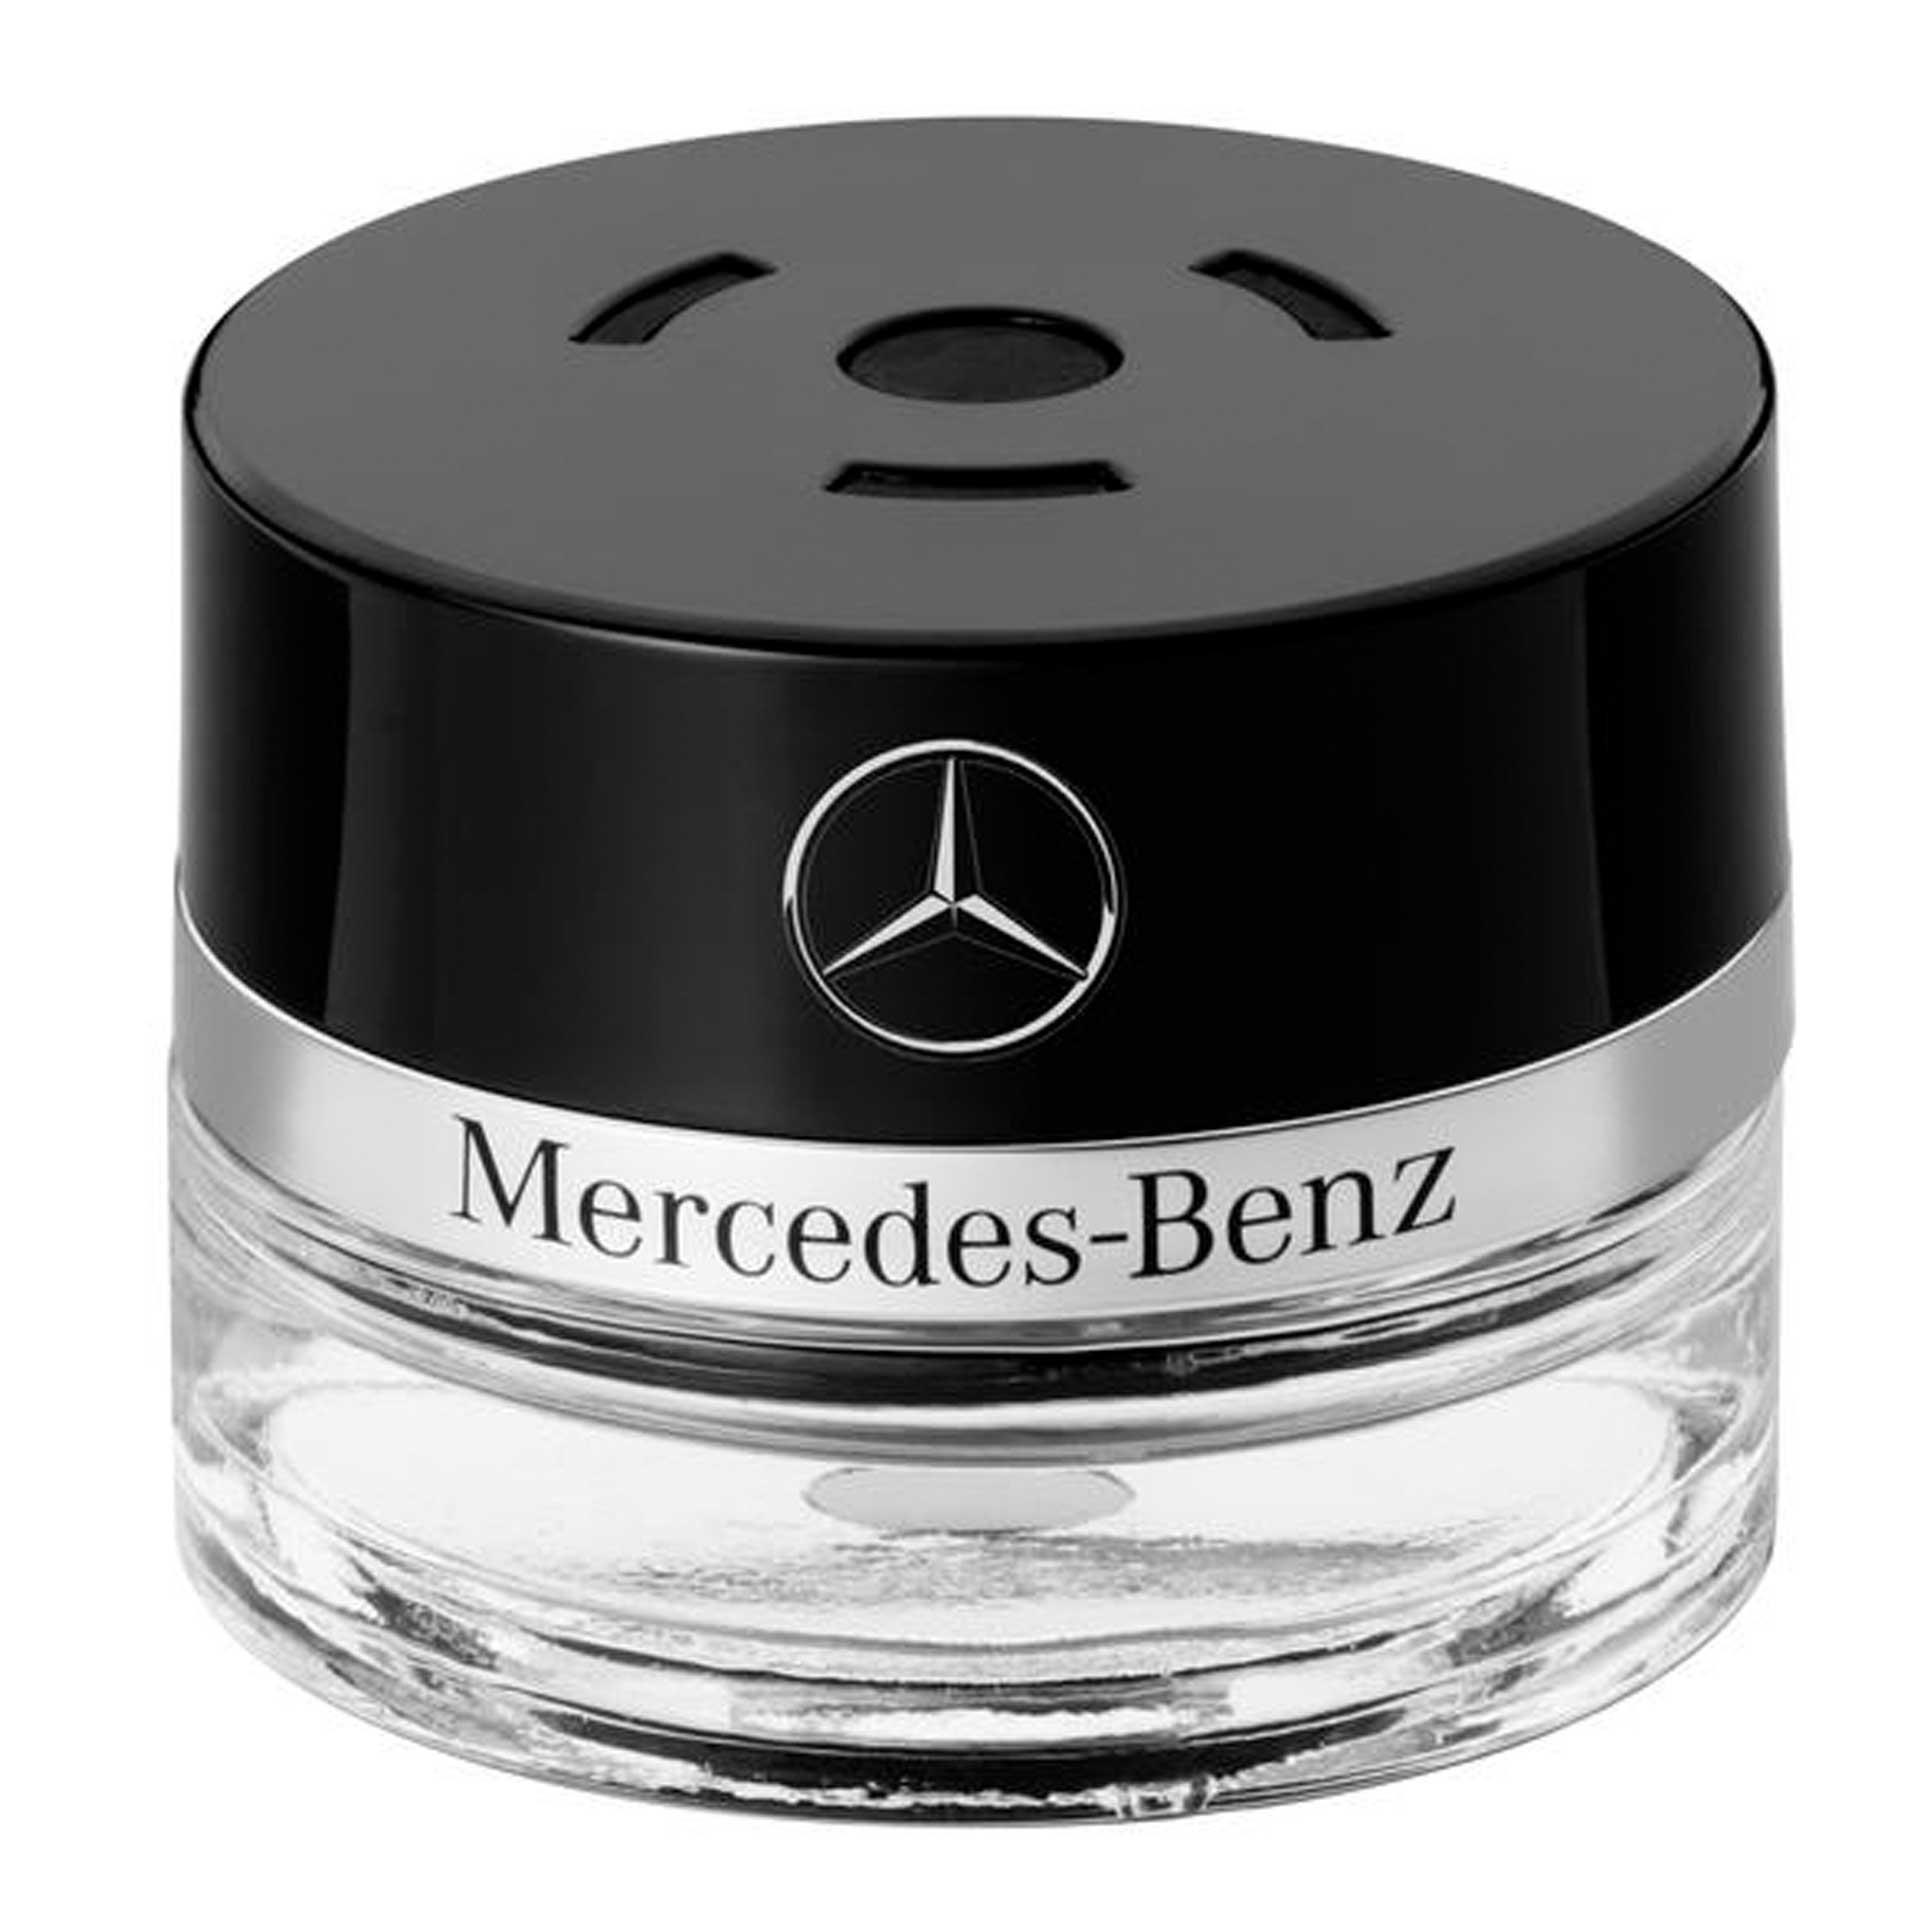 Mercedes-Benz Flakon 15 ml DAYBREAK MOOD  für AIR-BALANCE Paket